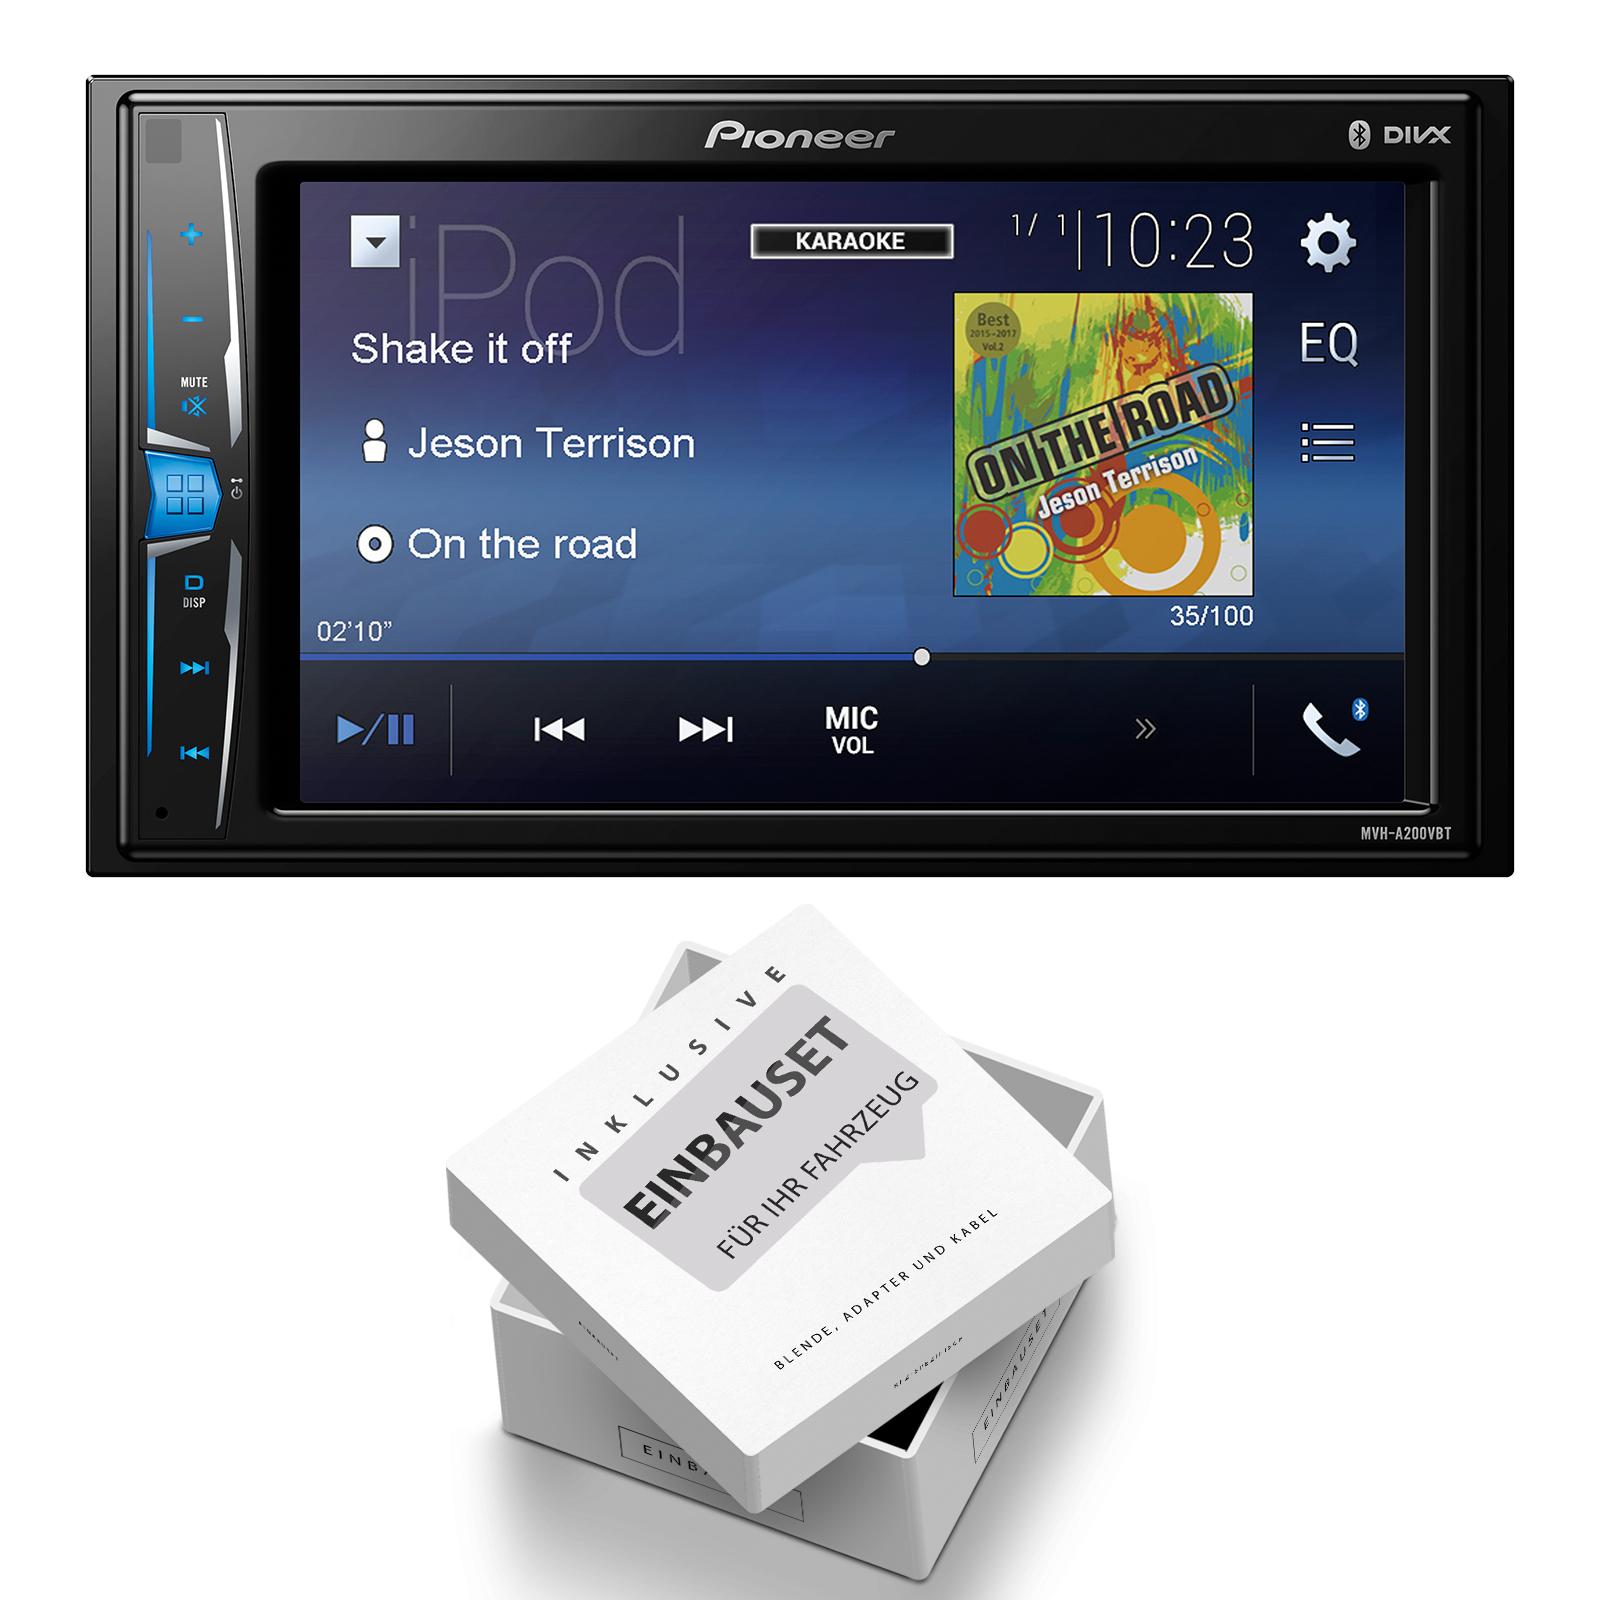 Pioneer Mvh A200vbt Radio Multimedia Bluetooth Für Honda Jazz Gg